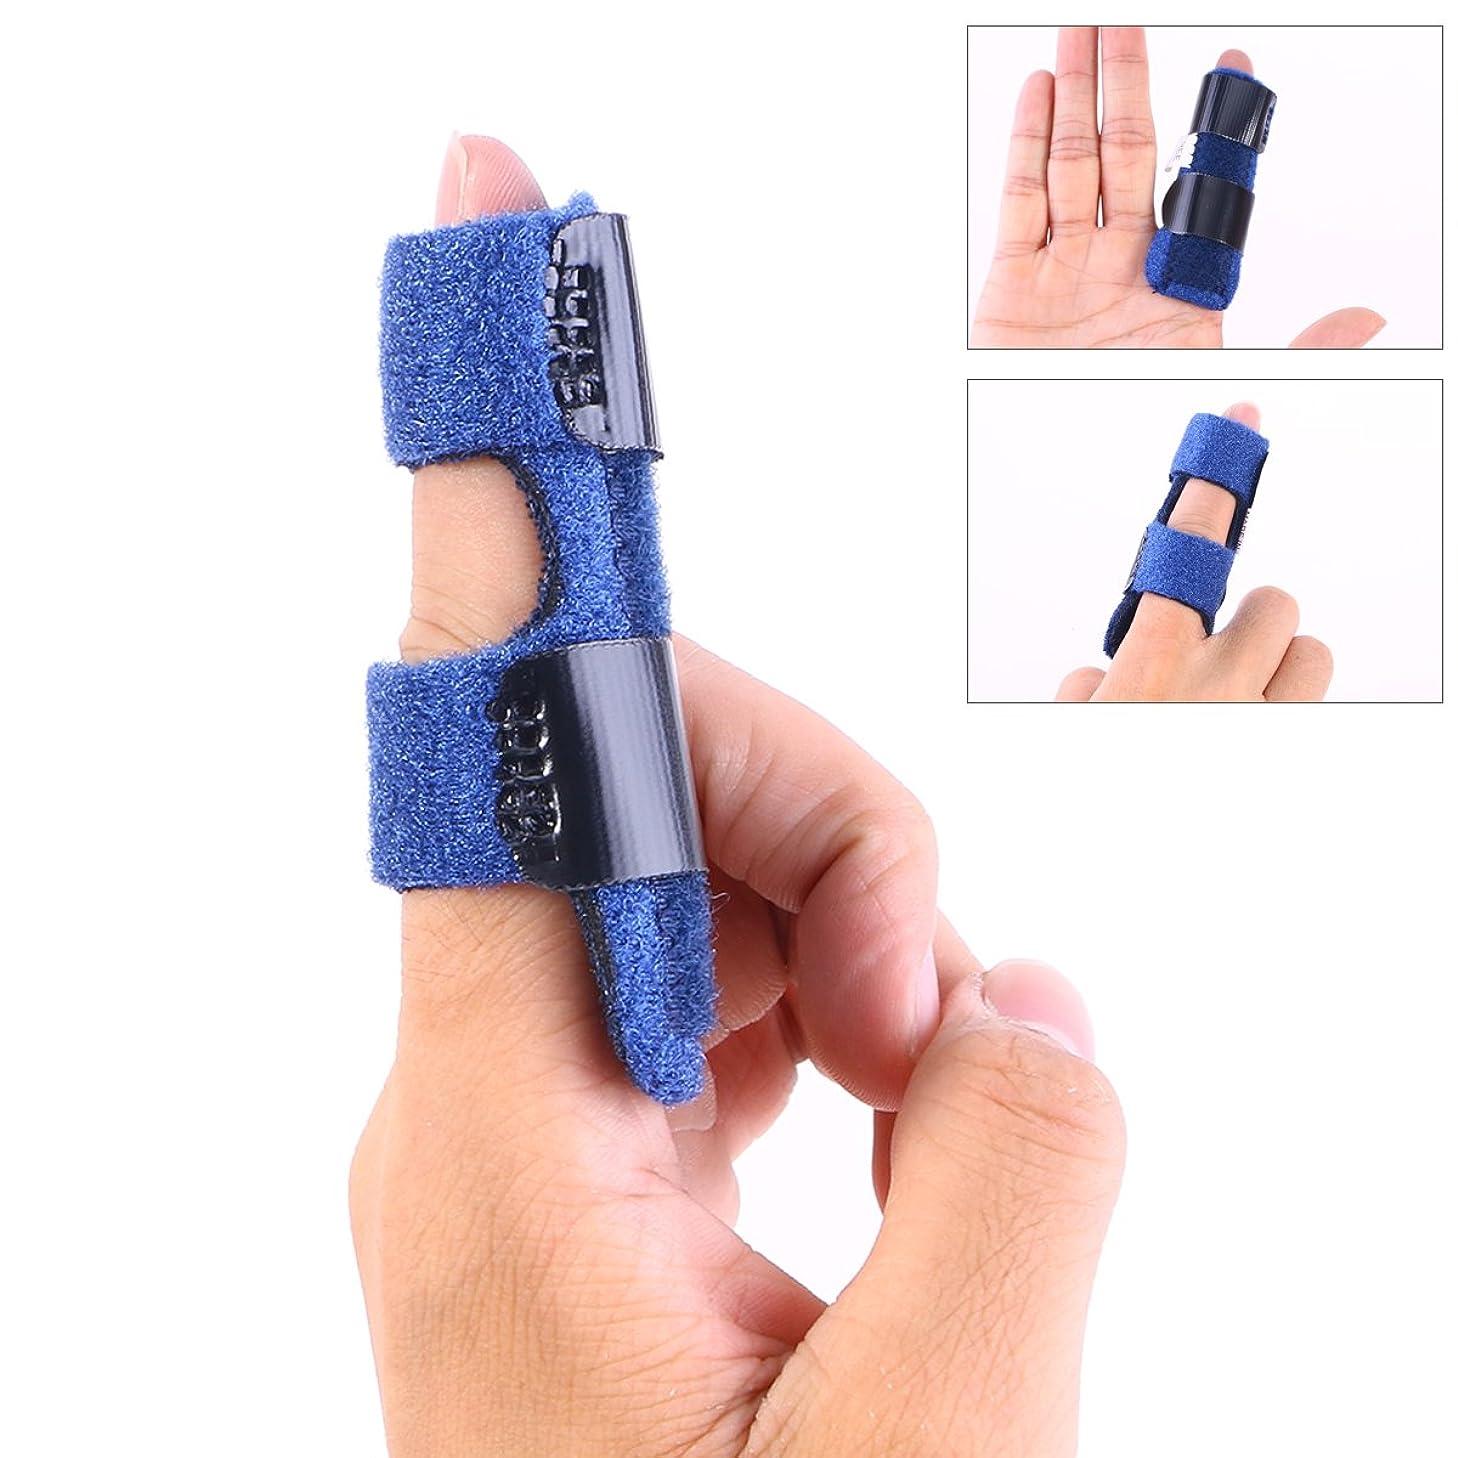 HEALLILY Finger Splint Trigger Finger Splint Mallet Splint Extension Finger Support